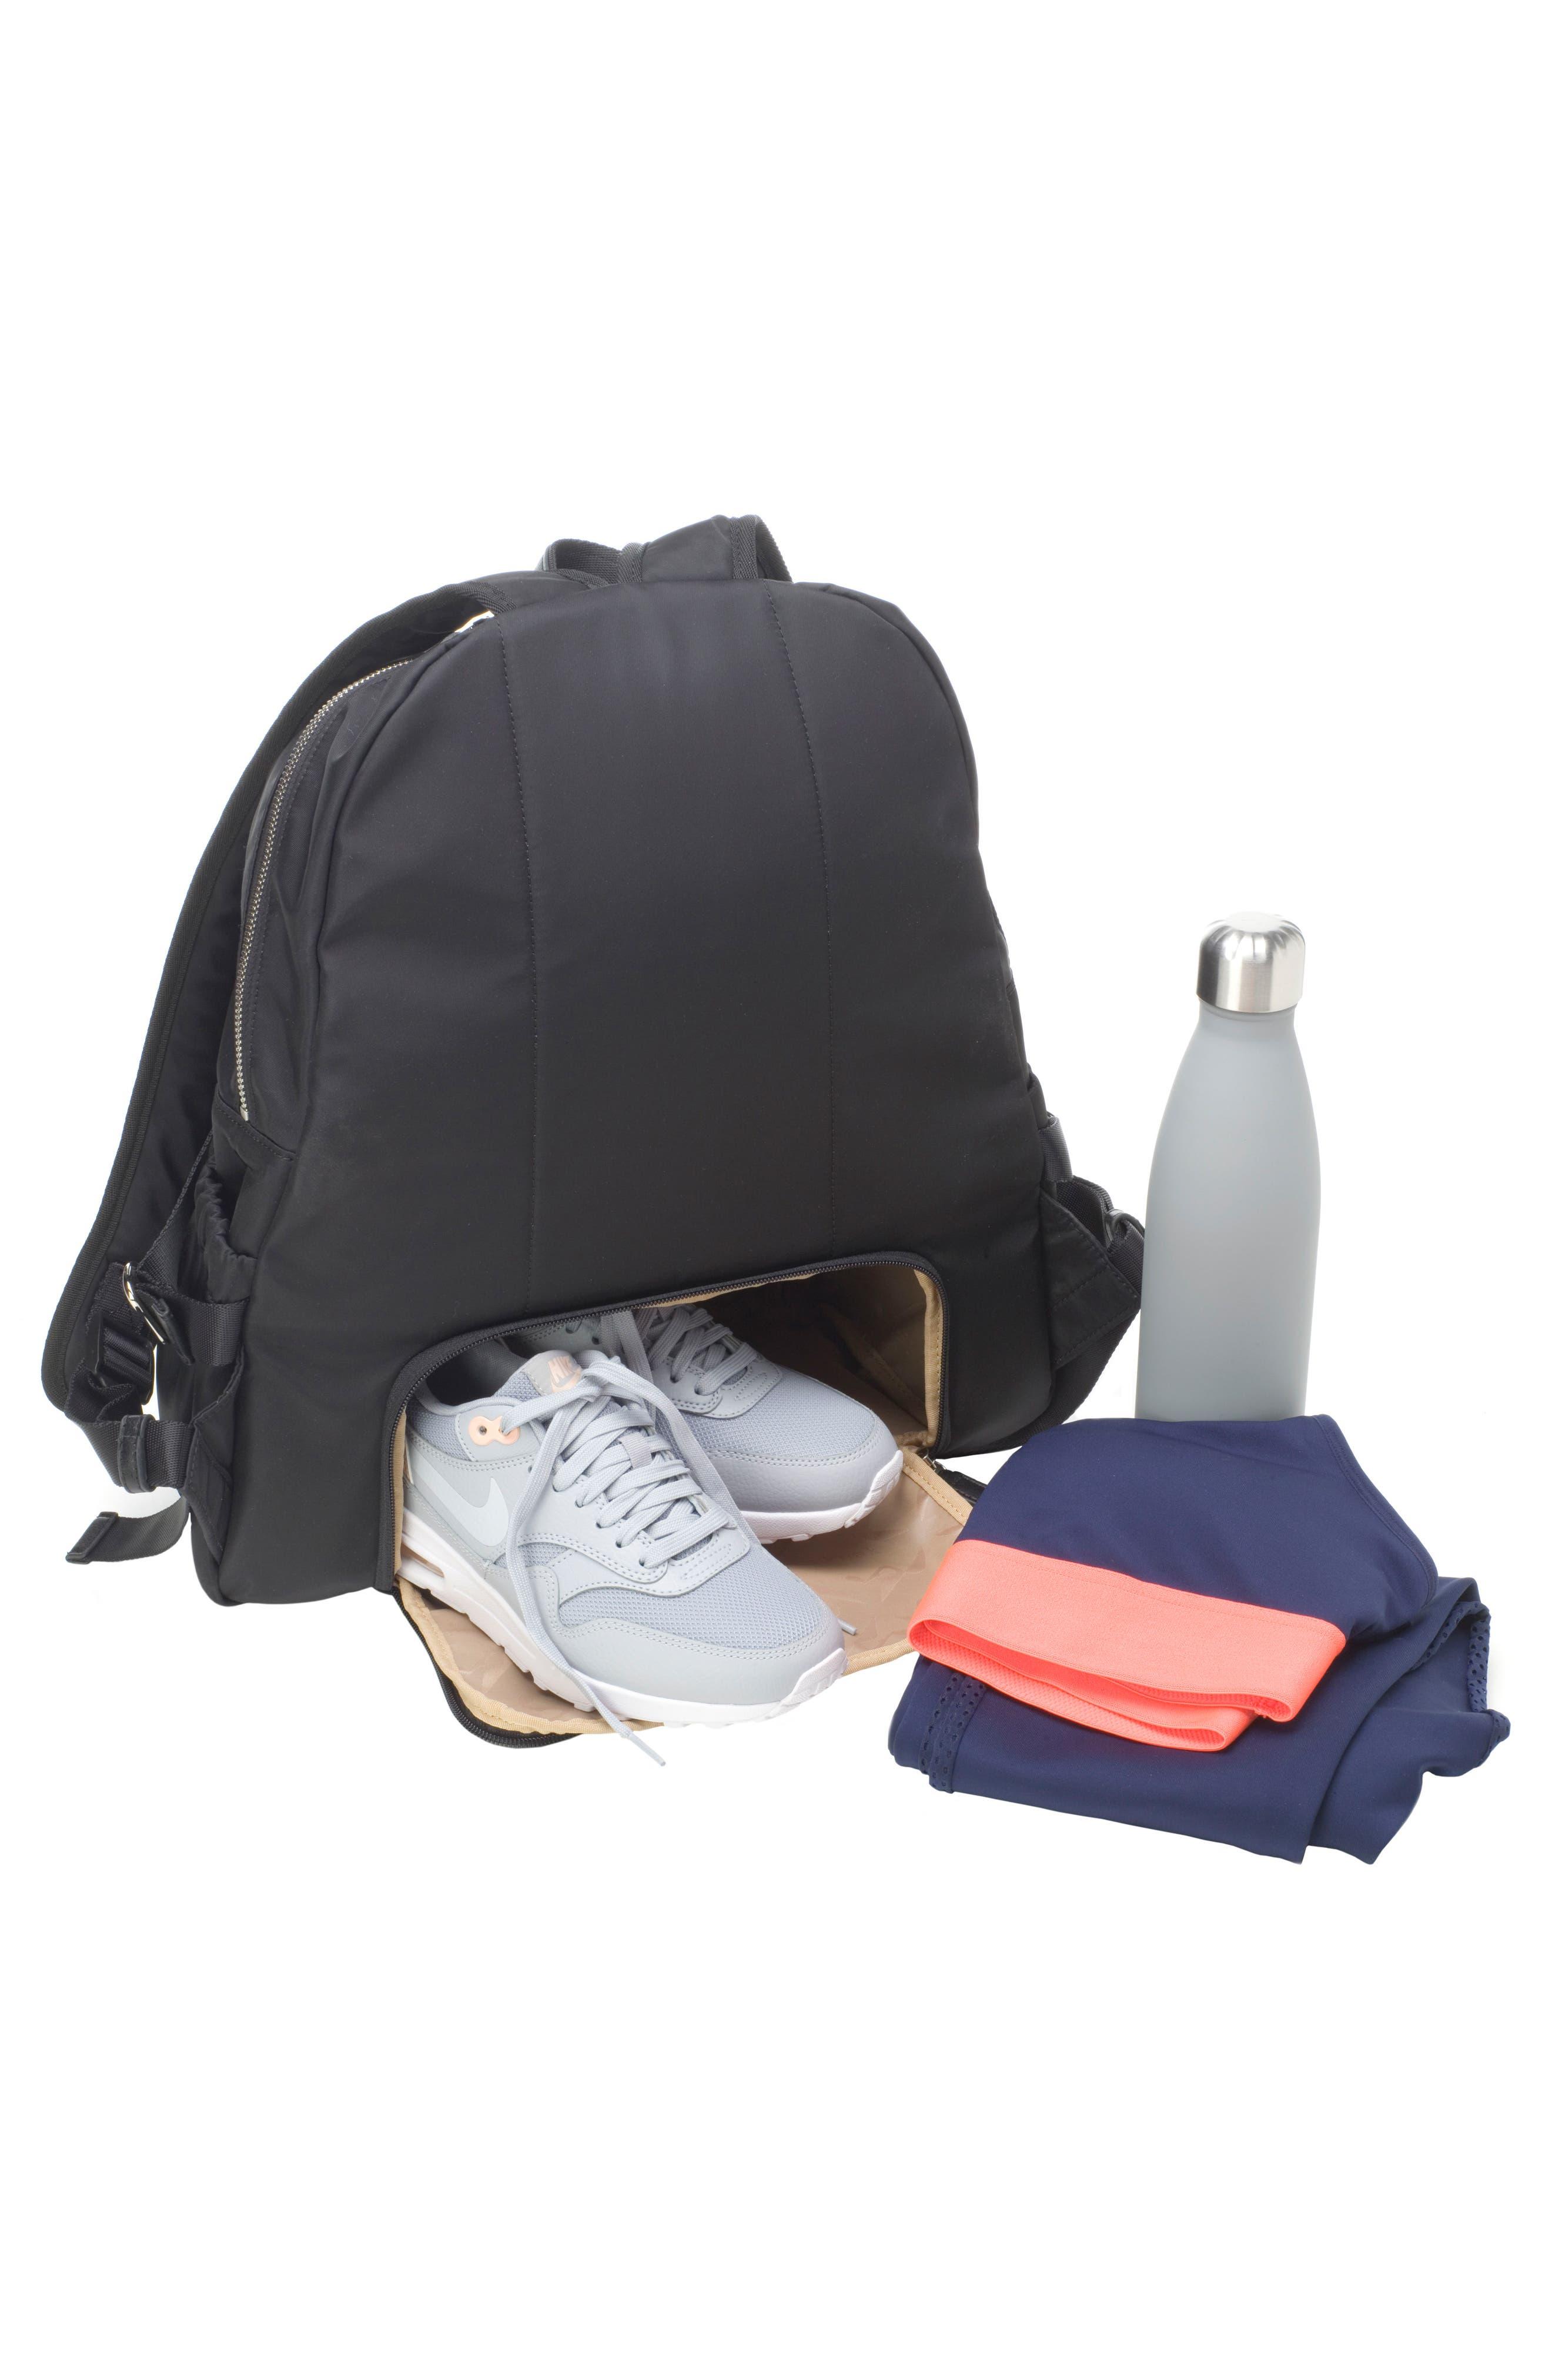 Hero Water Resistant Nylon Backpack Diaper Bag,                             Alternate thumbnail 16, color,                             BLACK